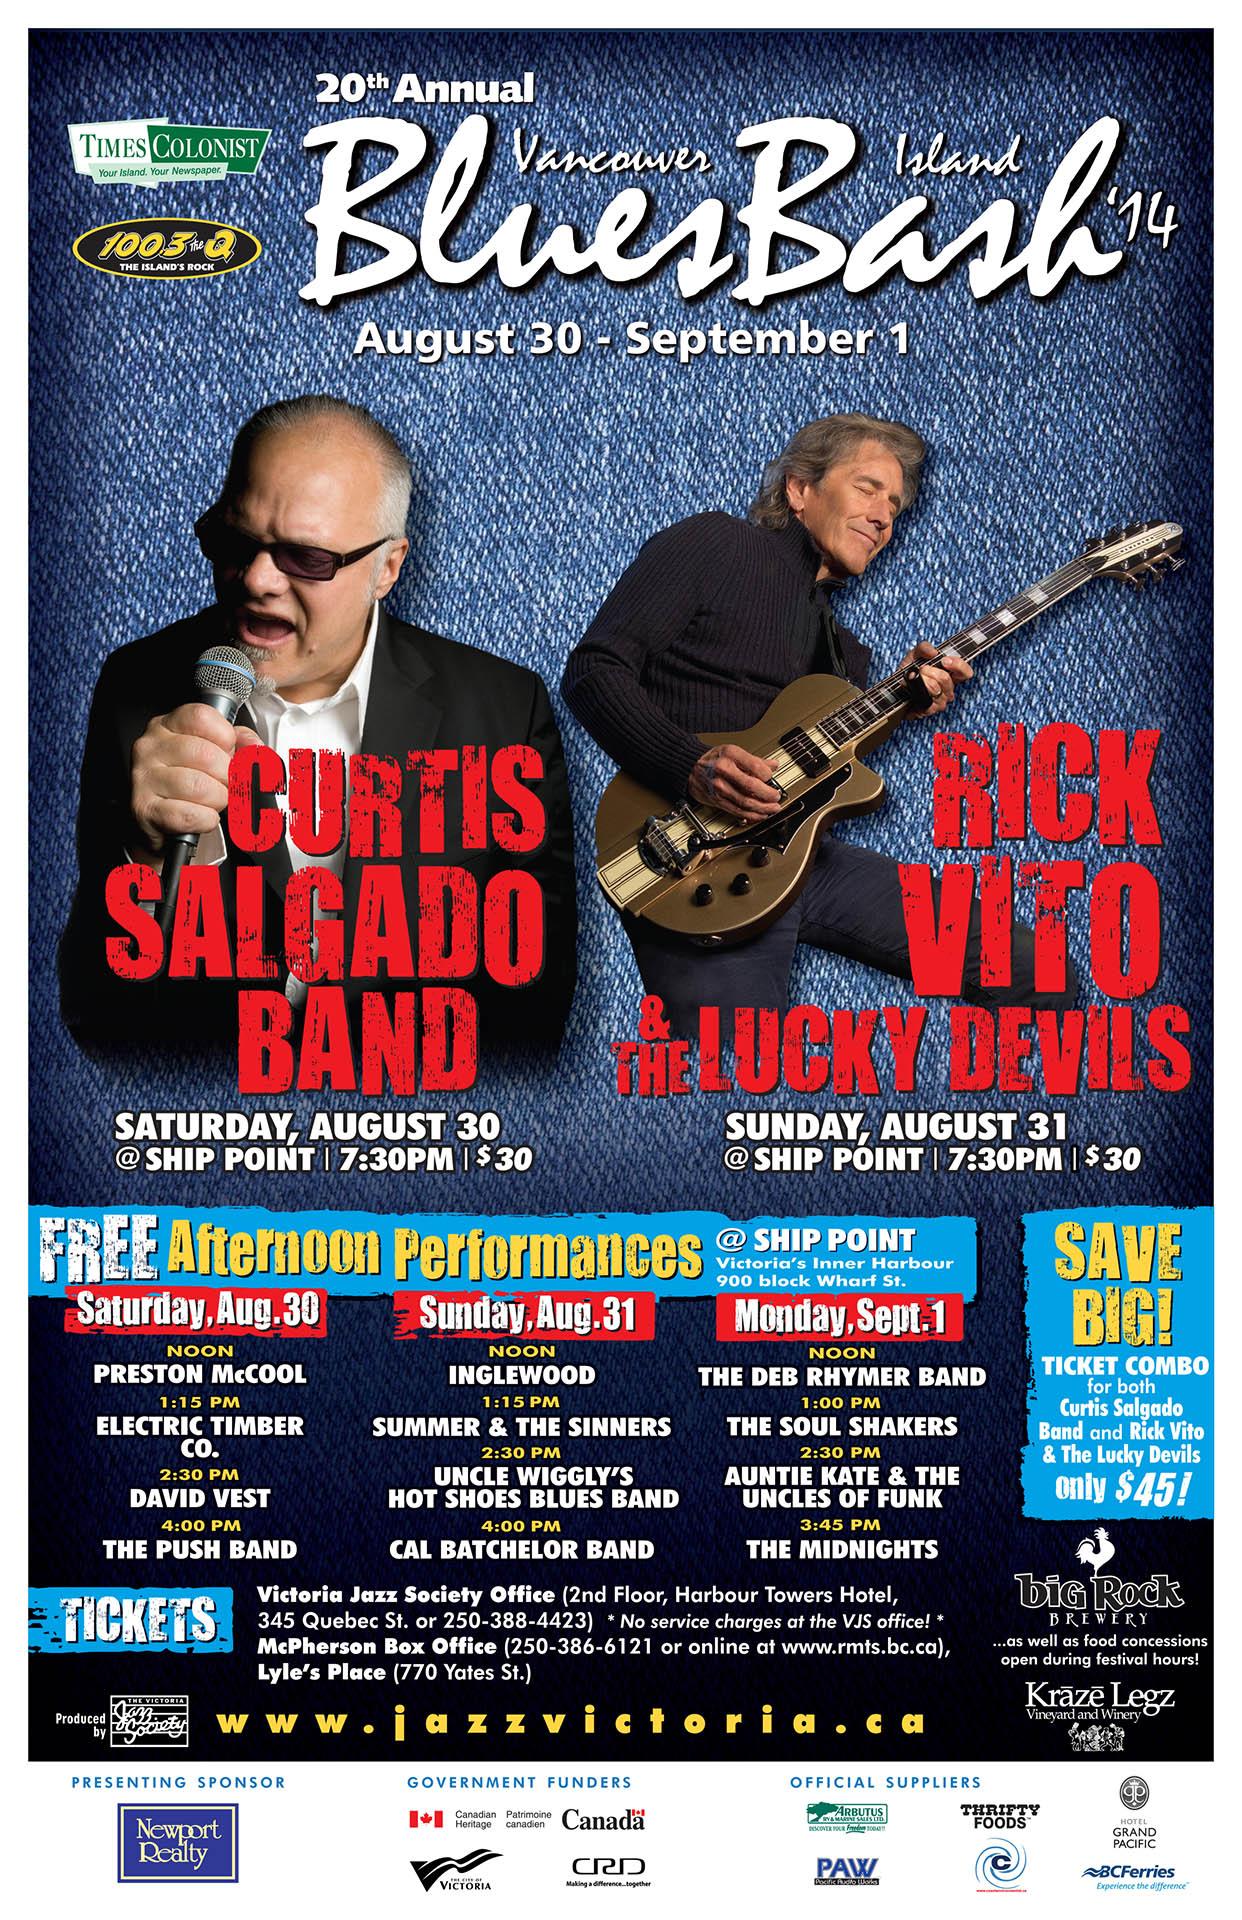 Vancouver Island Blues Bash - 2014